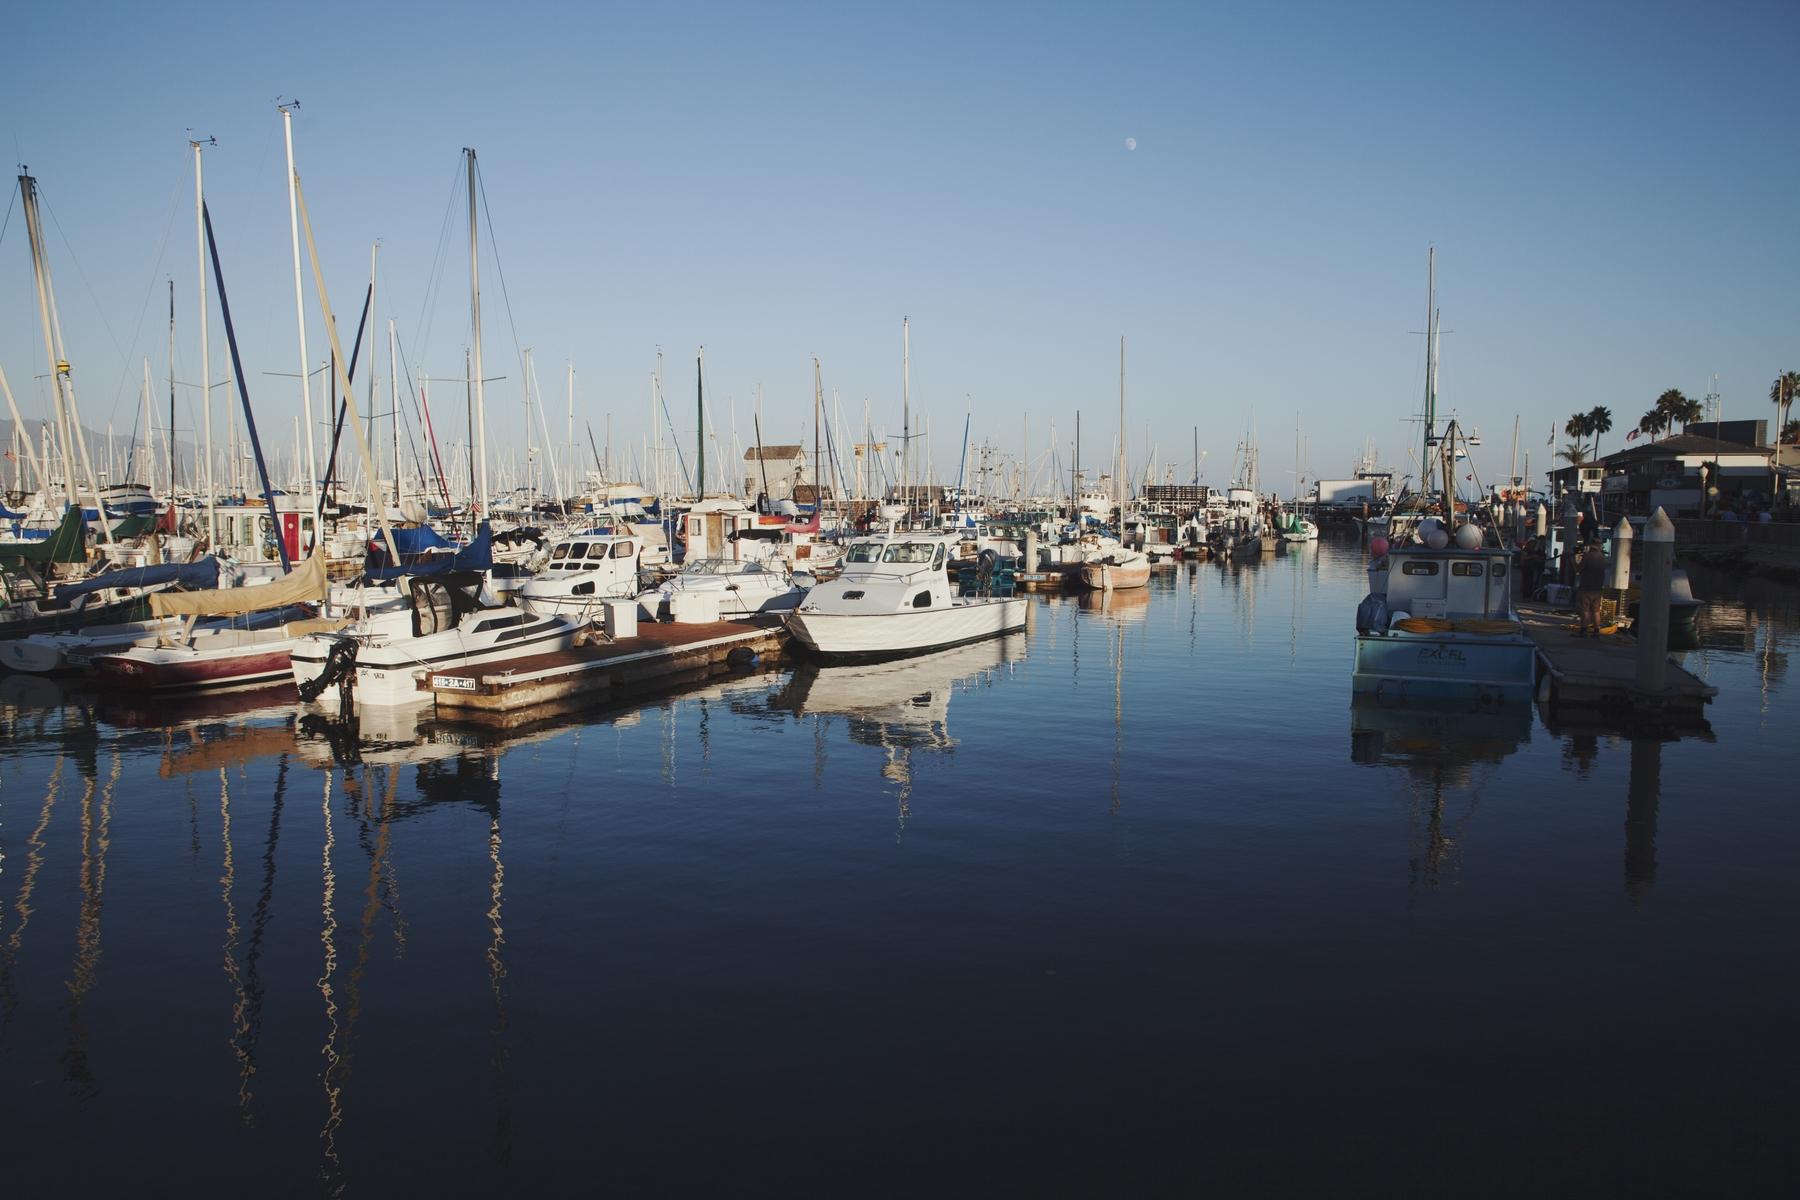 The Santa Barbara Wharf